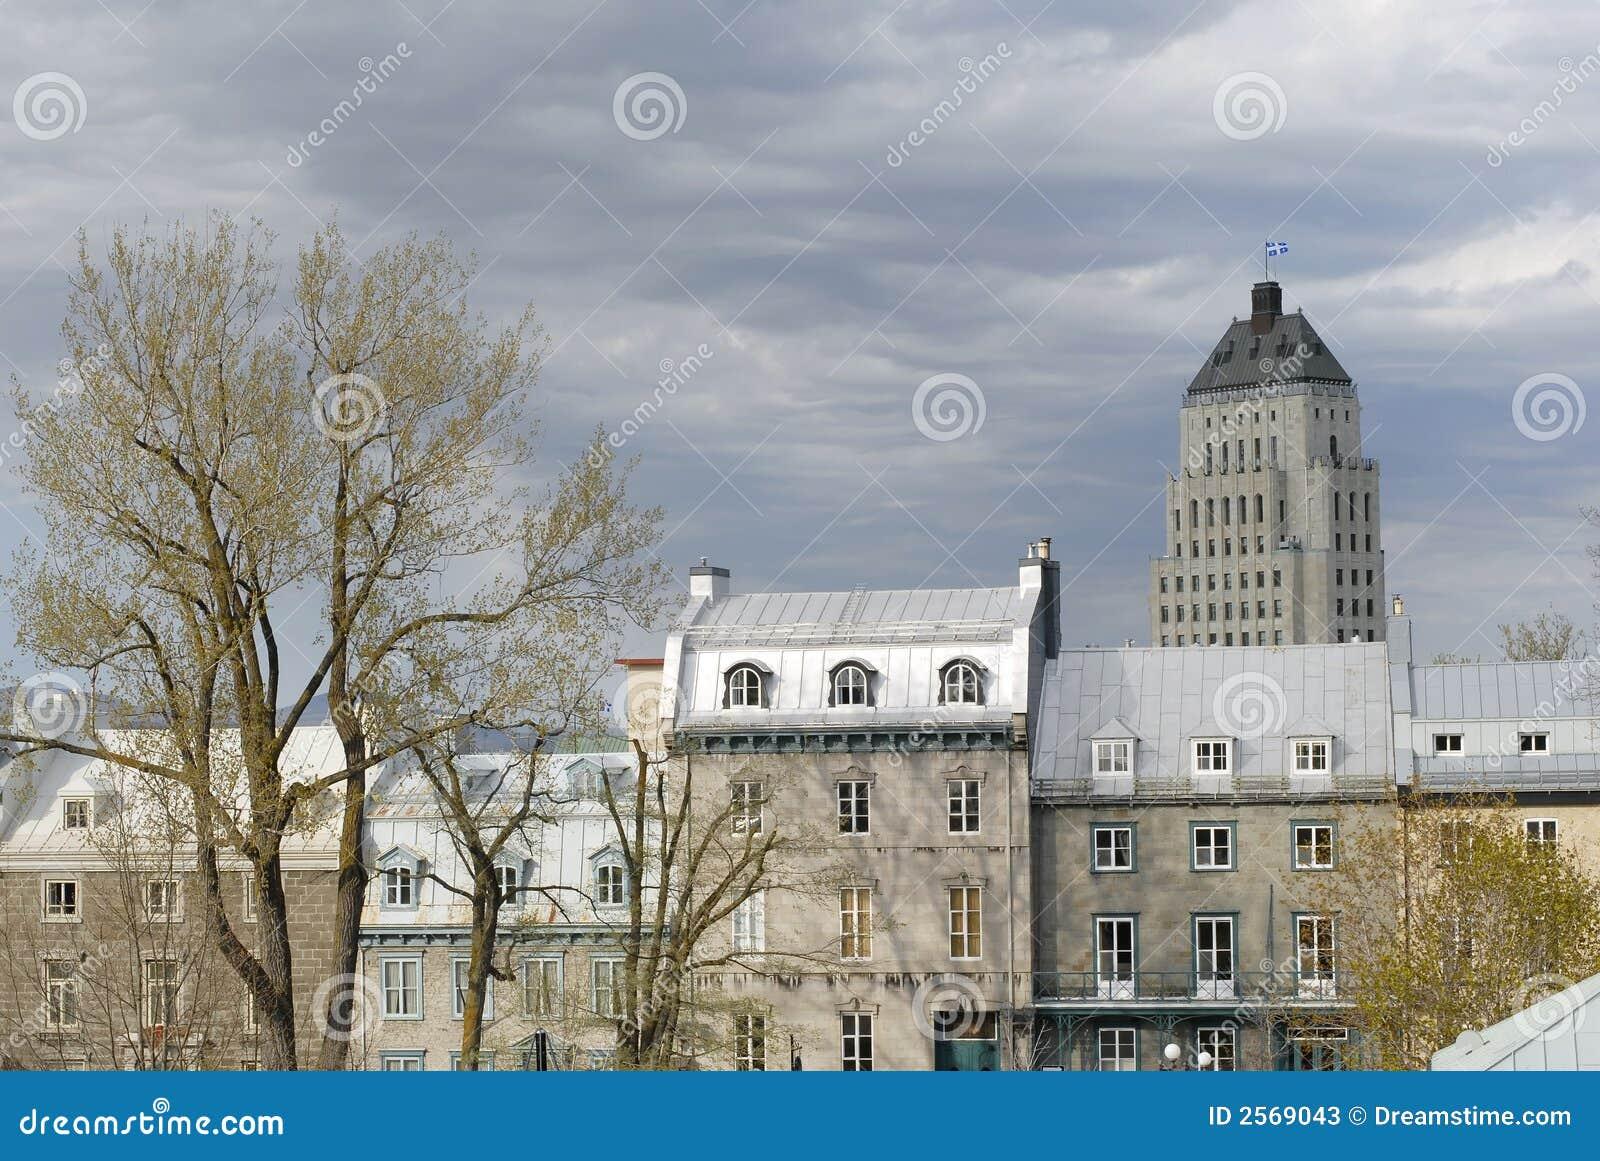 Quebec city architecture stock photos image 2569043 for Architecture quebec